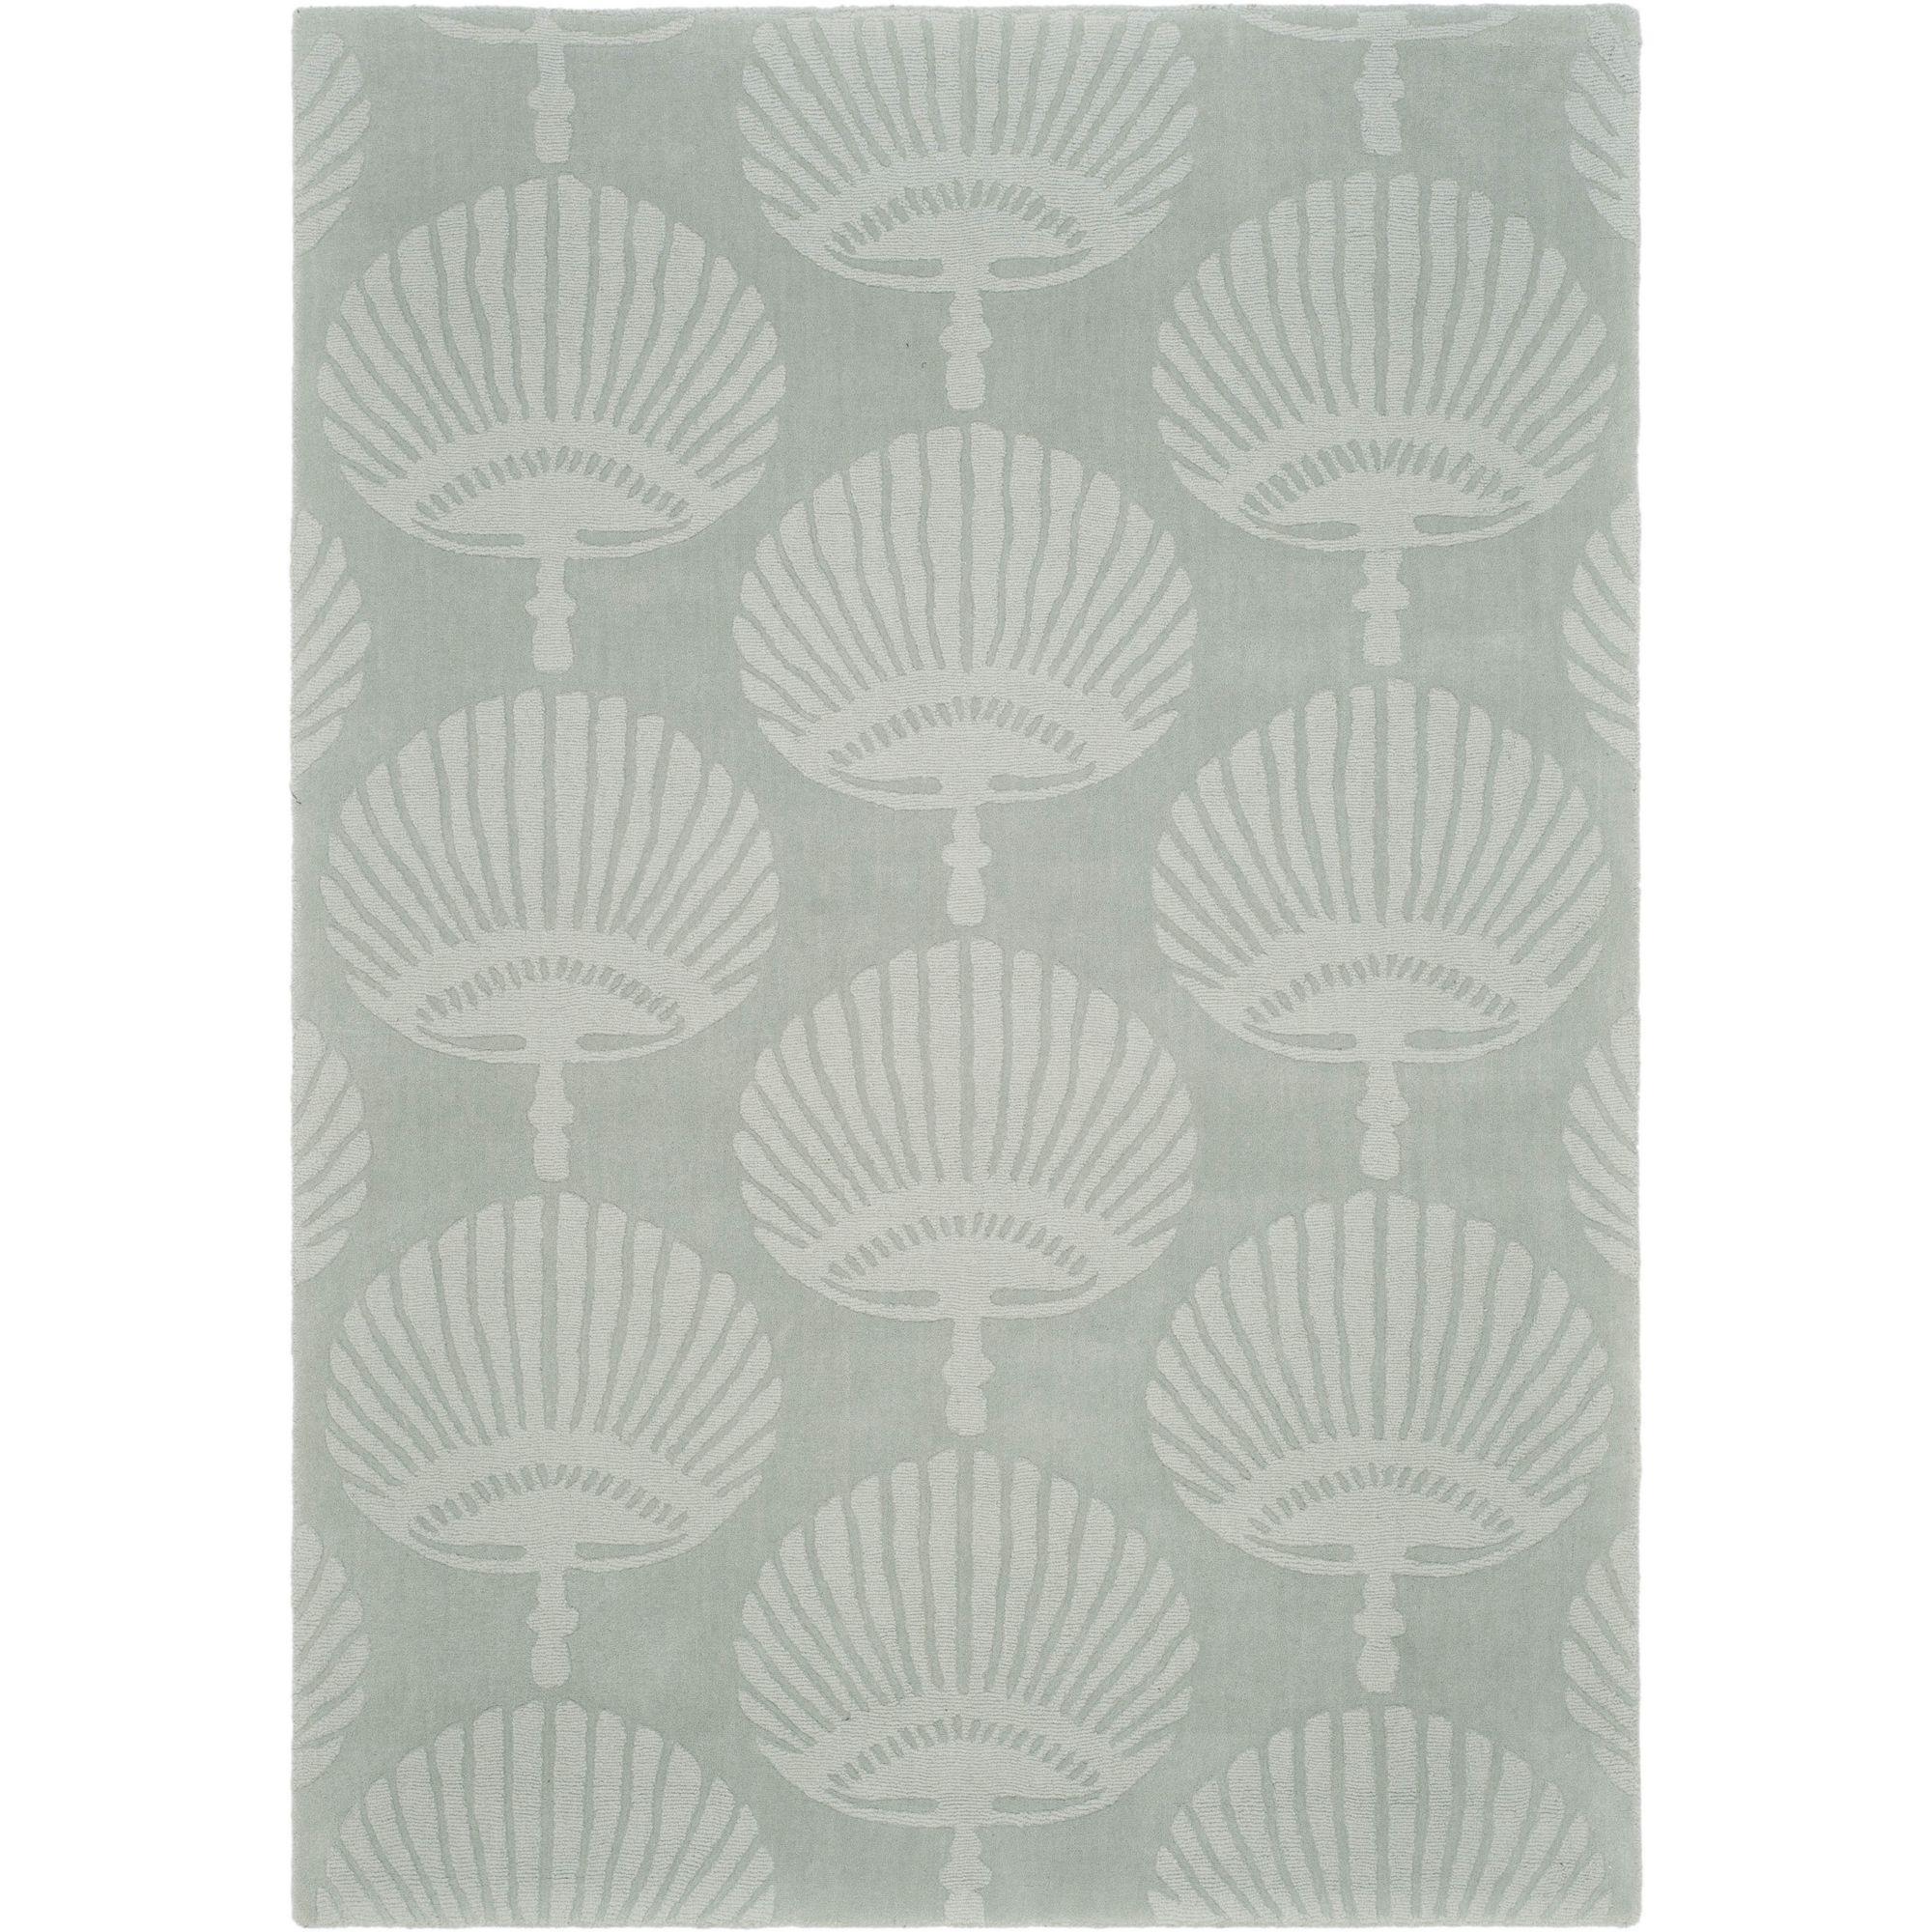 Safavieh Handmade Sea Shells Grey New Zealand Wool Rug (7' 6 x 9' 6 ) (IM411A-8) (Cotton, Geometric)